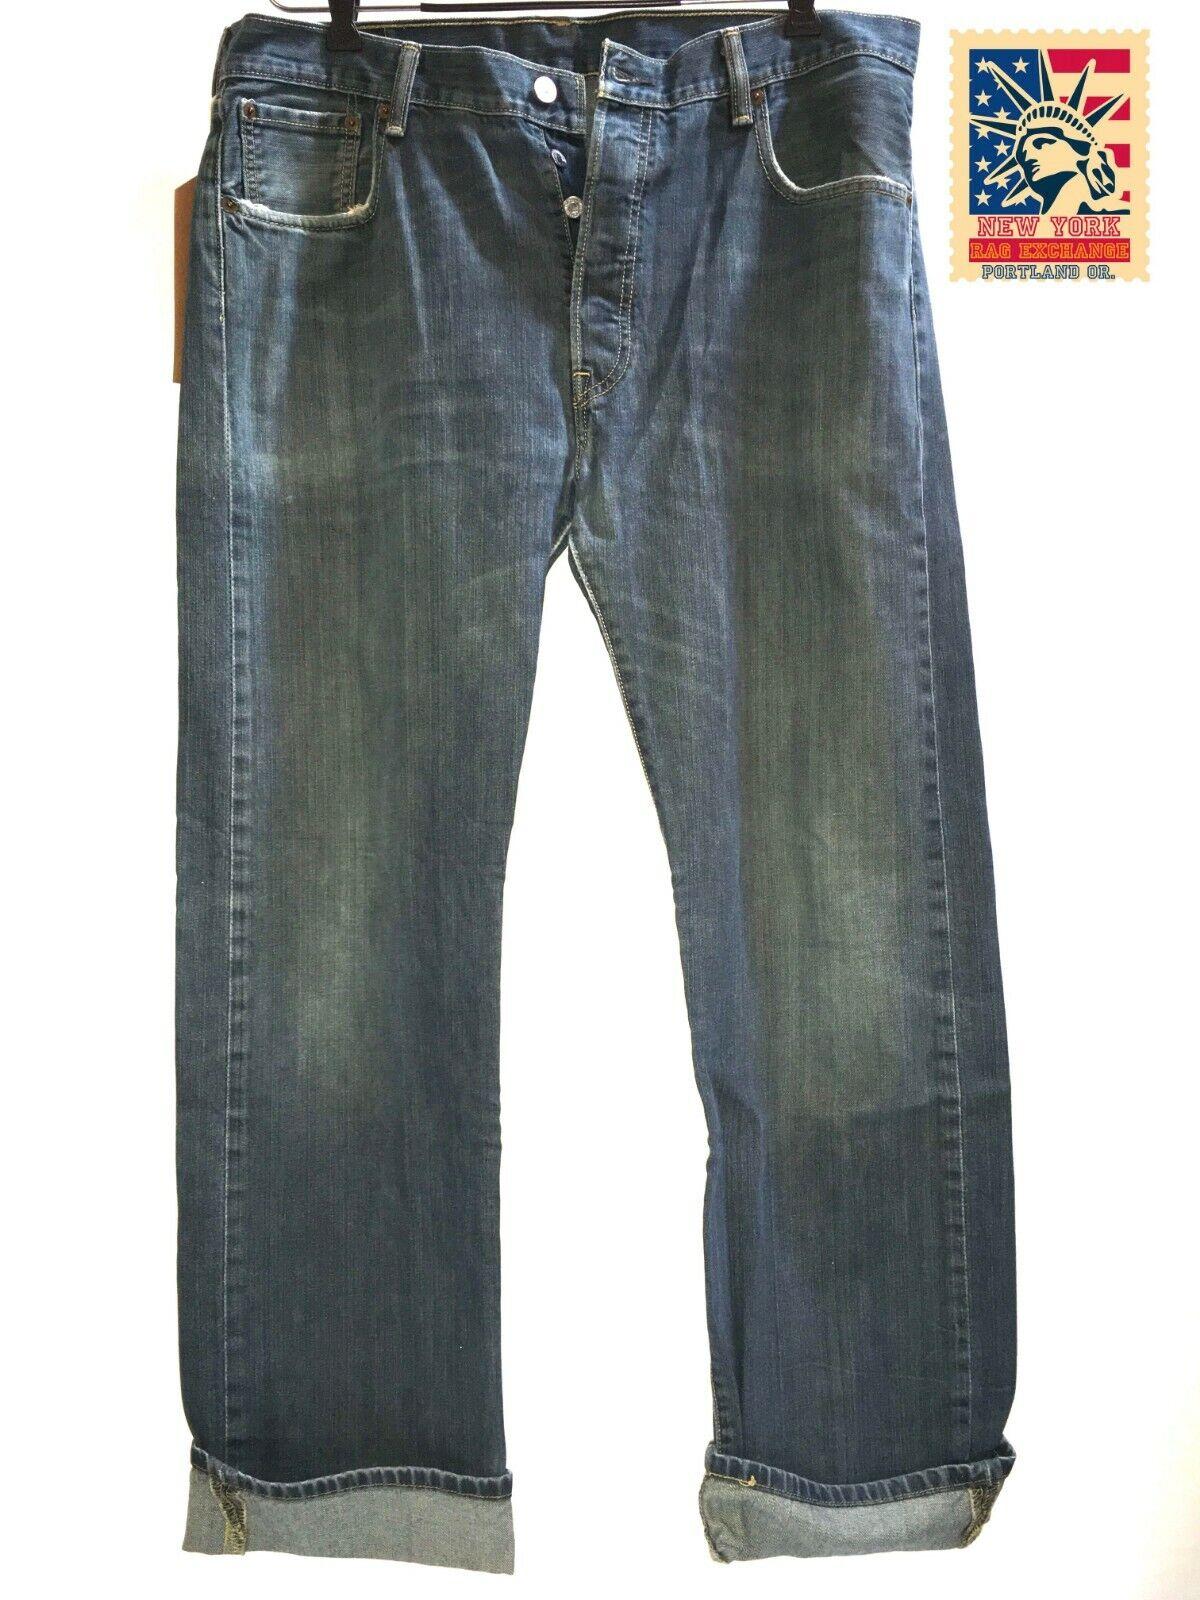 Levi's 501 Jeans Distressed Faded Vintage Denim t… - image 2